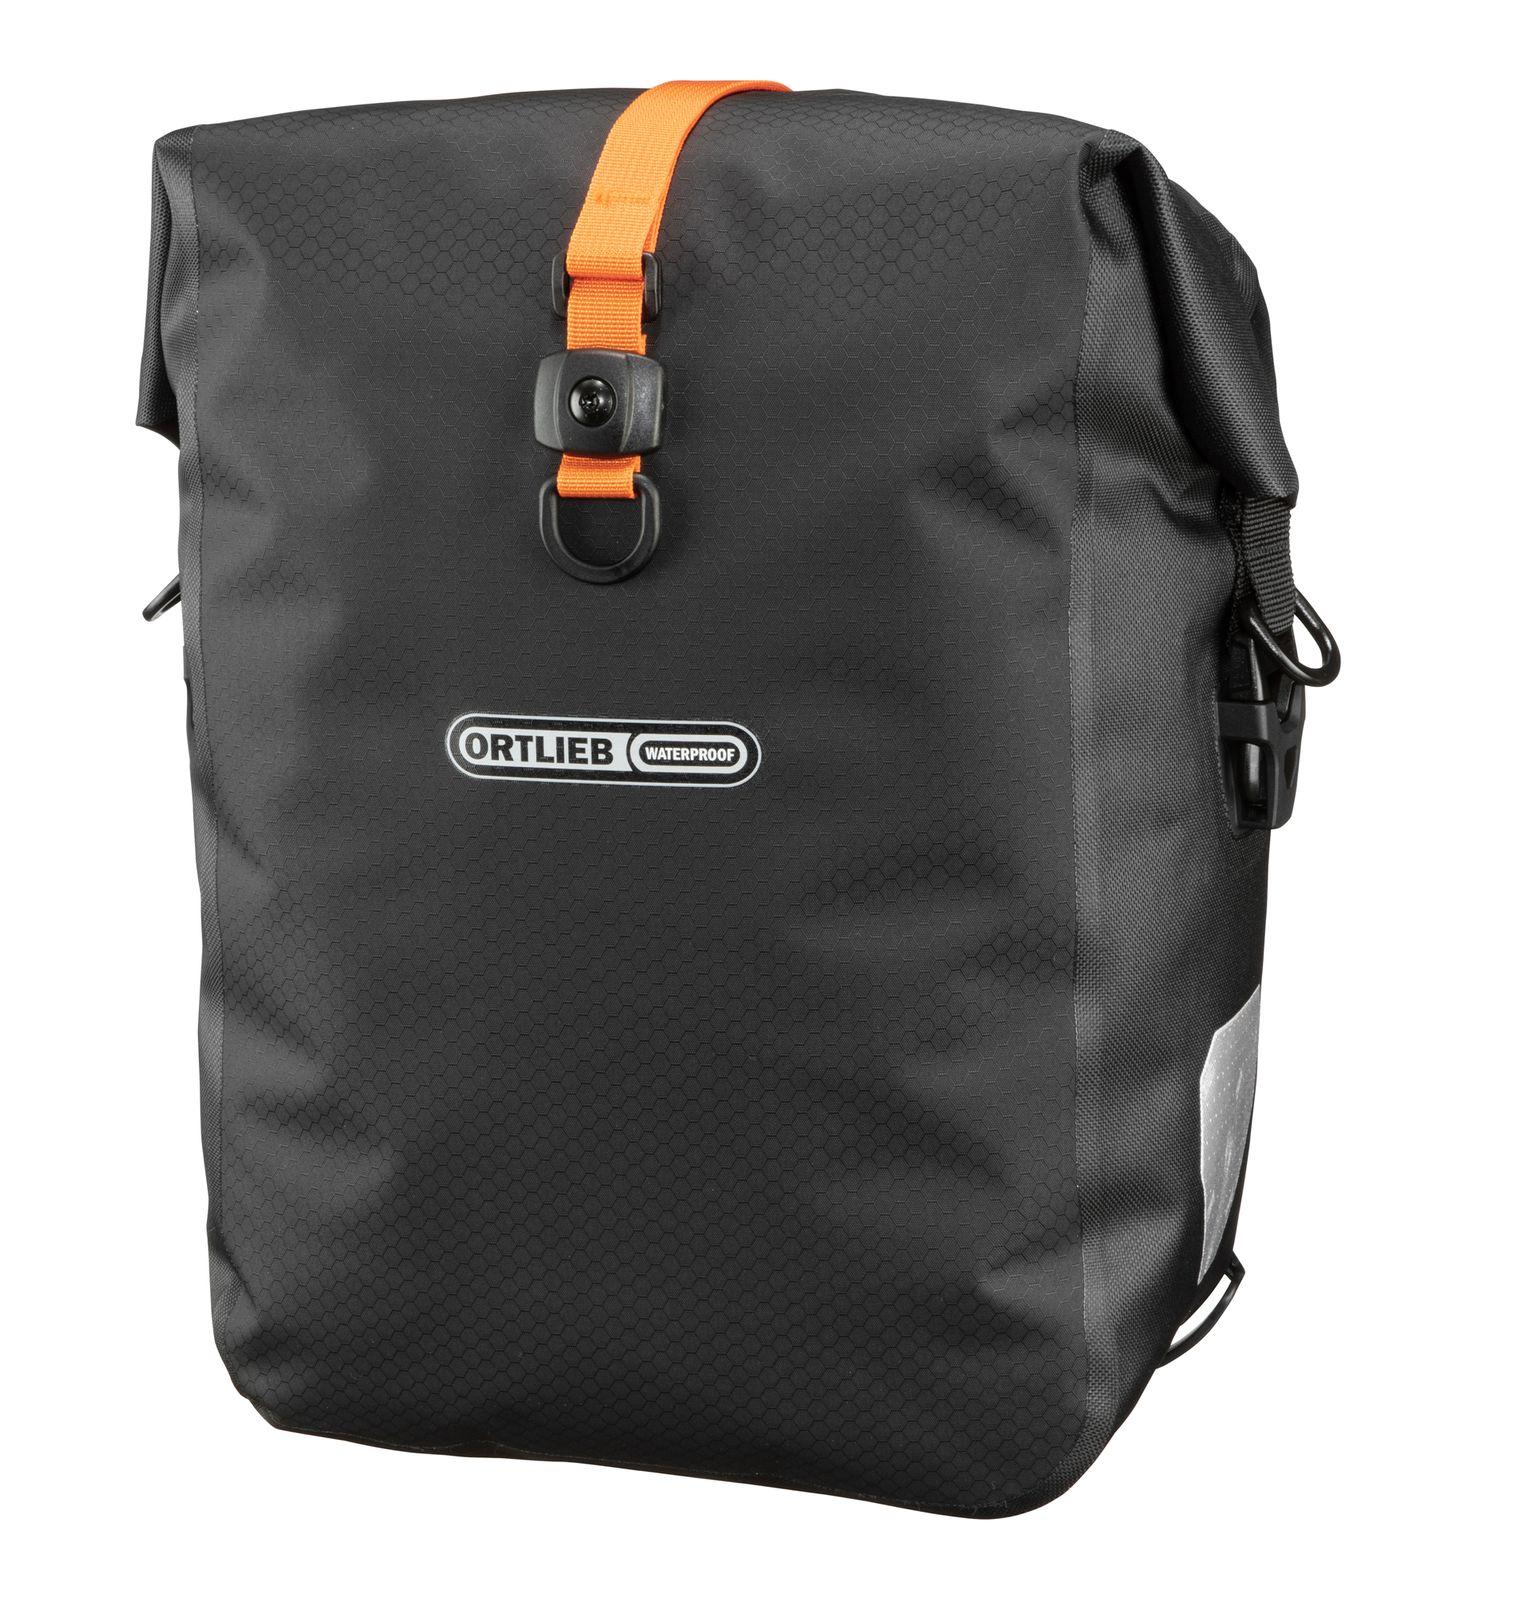 ORTLIEB Bike Packing Gravel-Pack Bike Side Panniers (QL2.1) 25L - Pair Black Matt